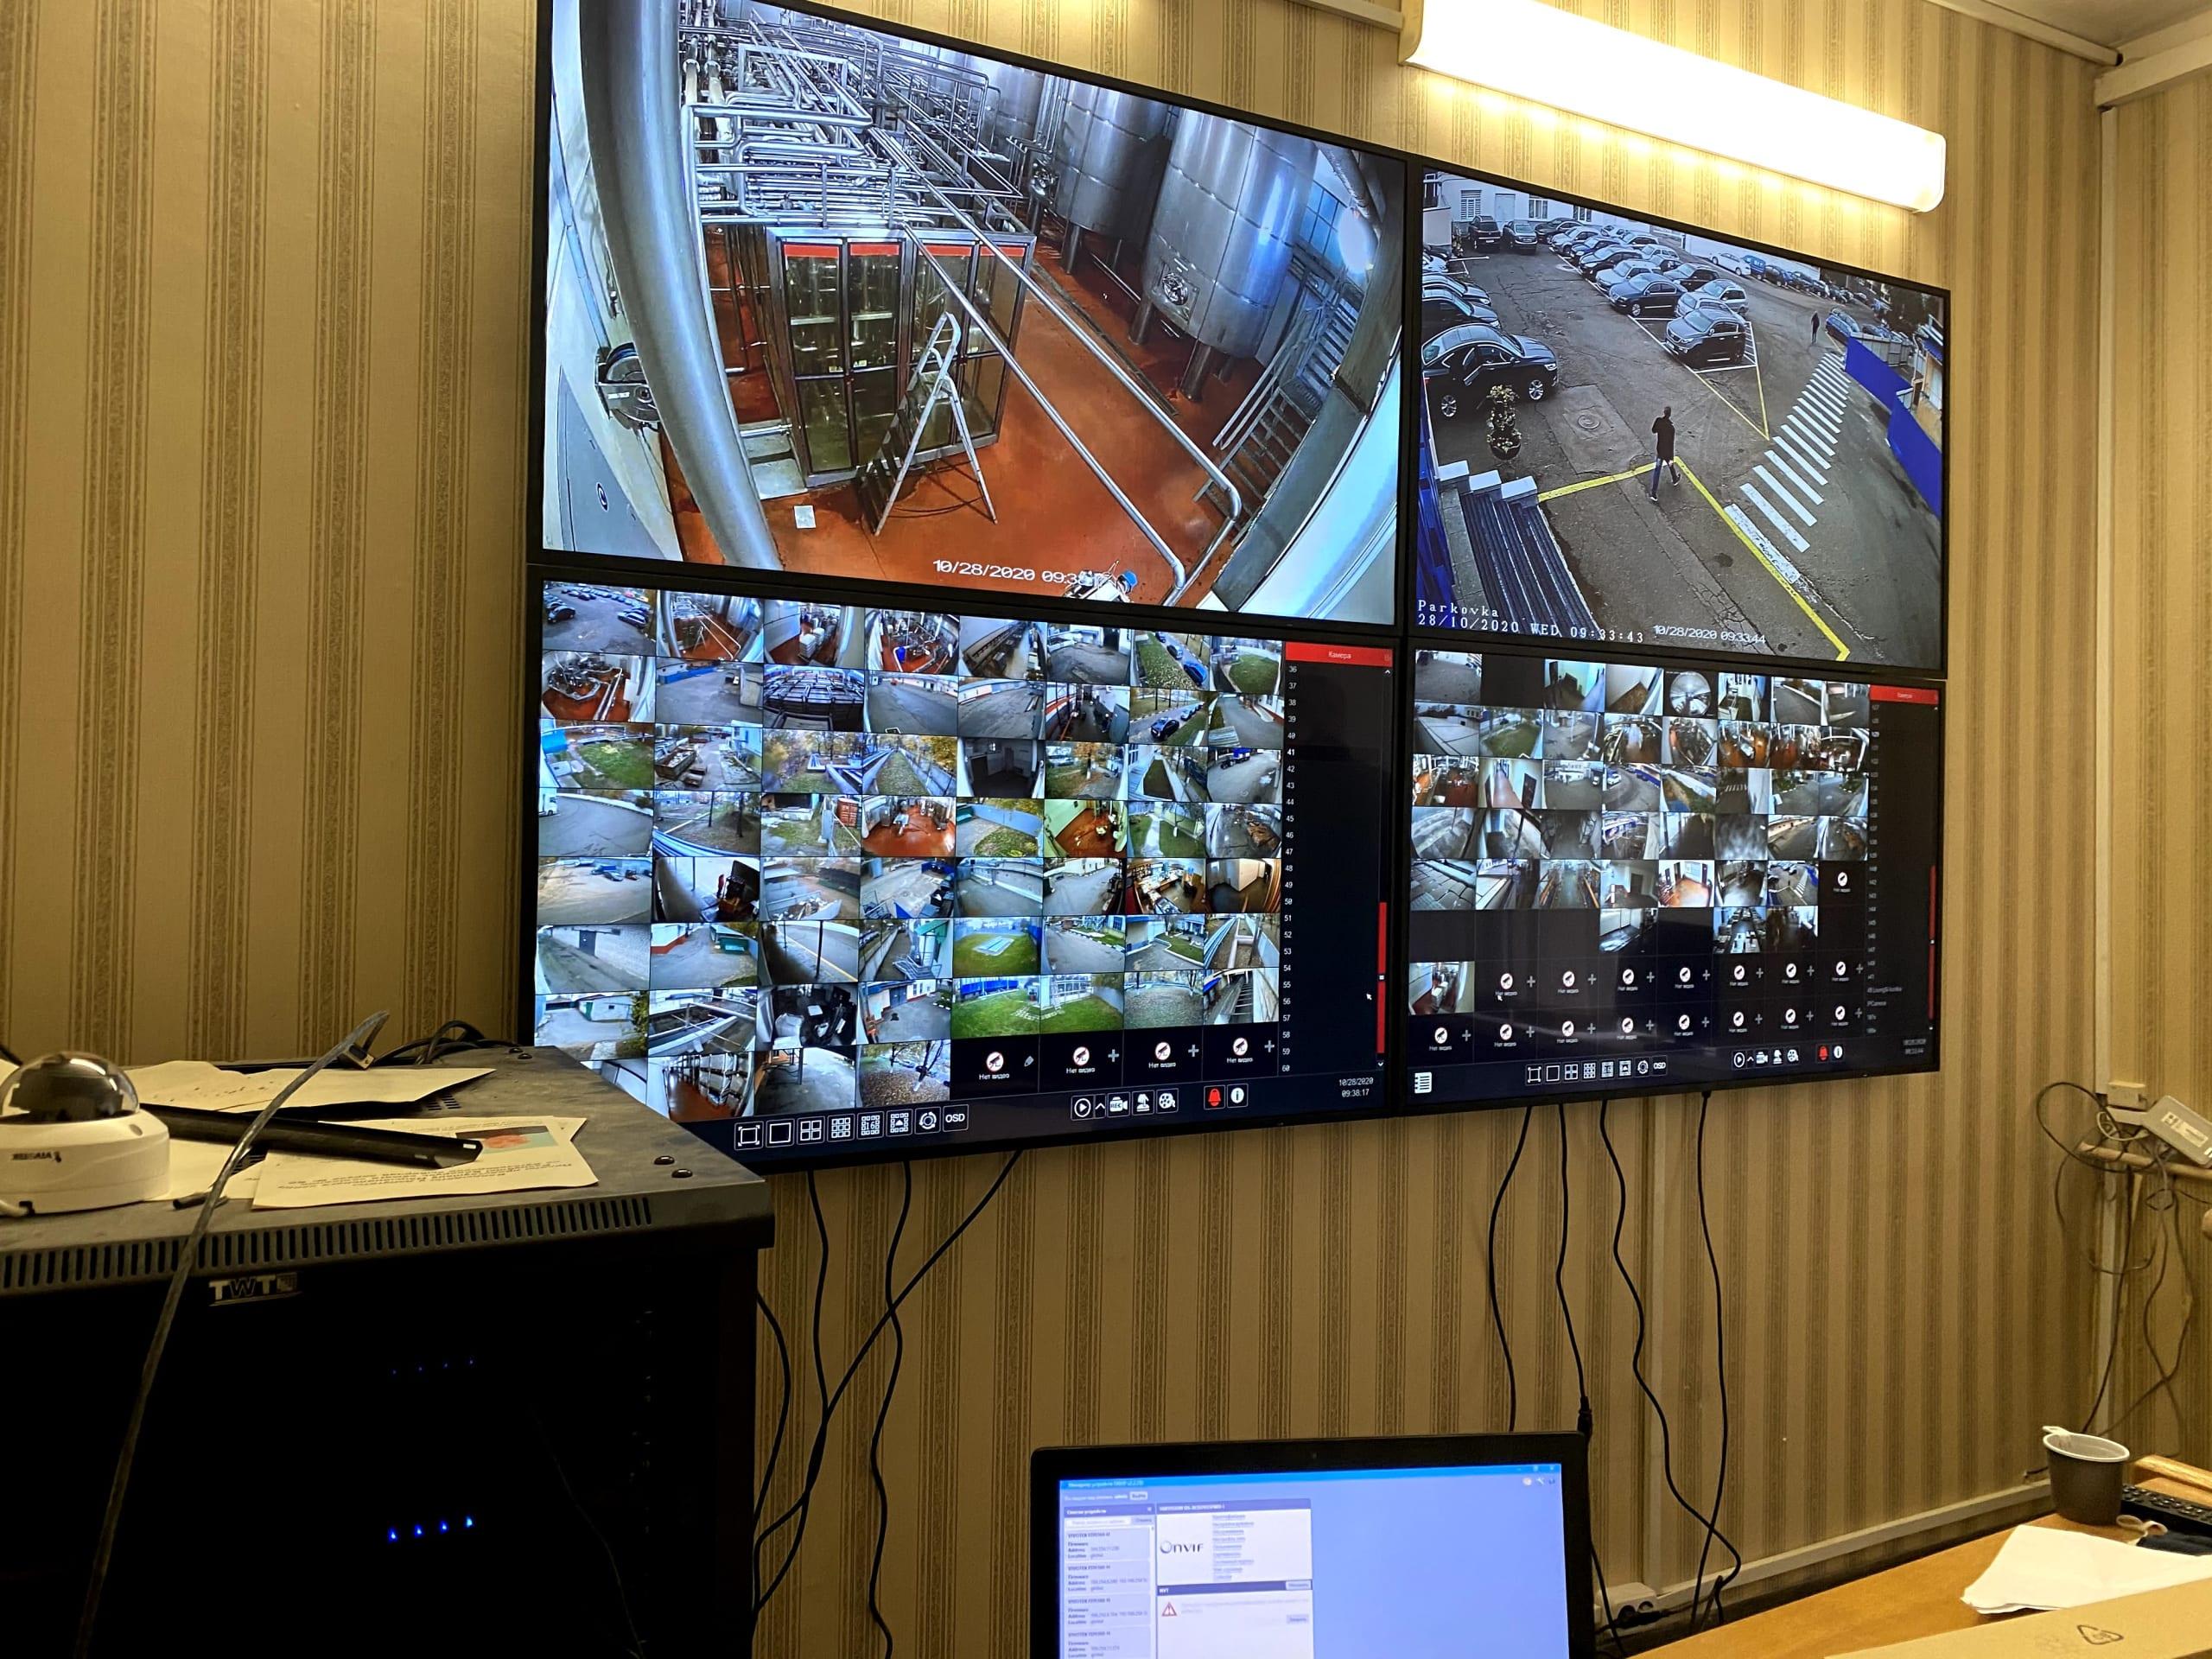 Контроль охраняемой территории на телевизоре.